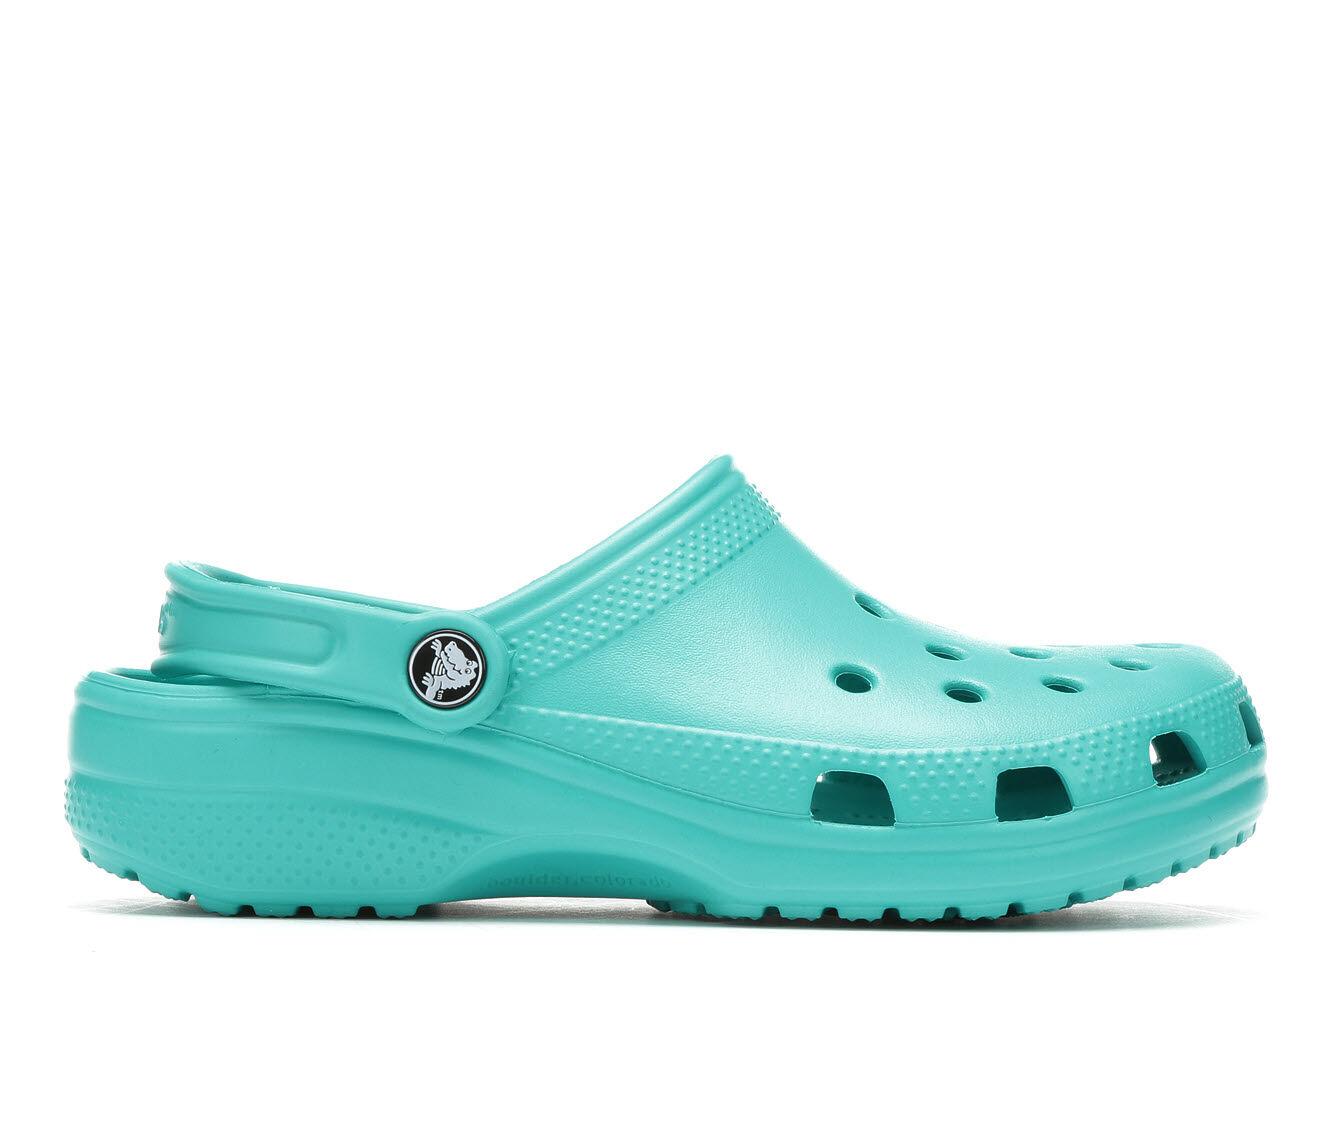 Women's Crocs Classic Clogs Tropical Teal